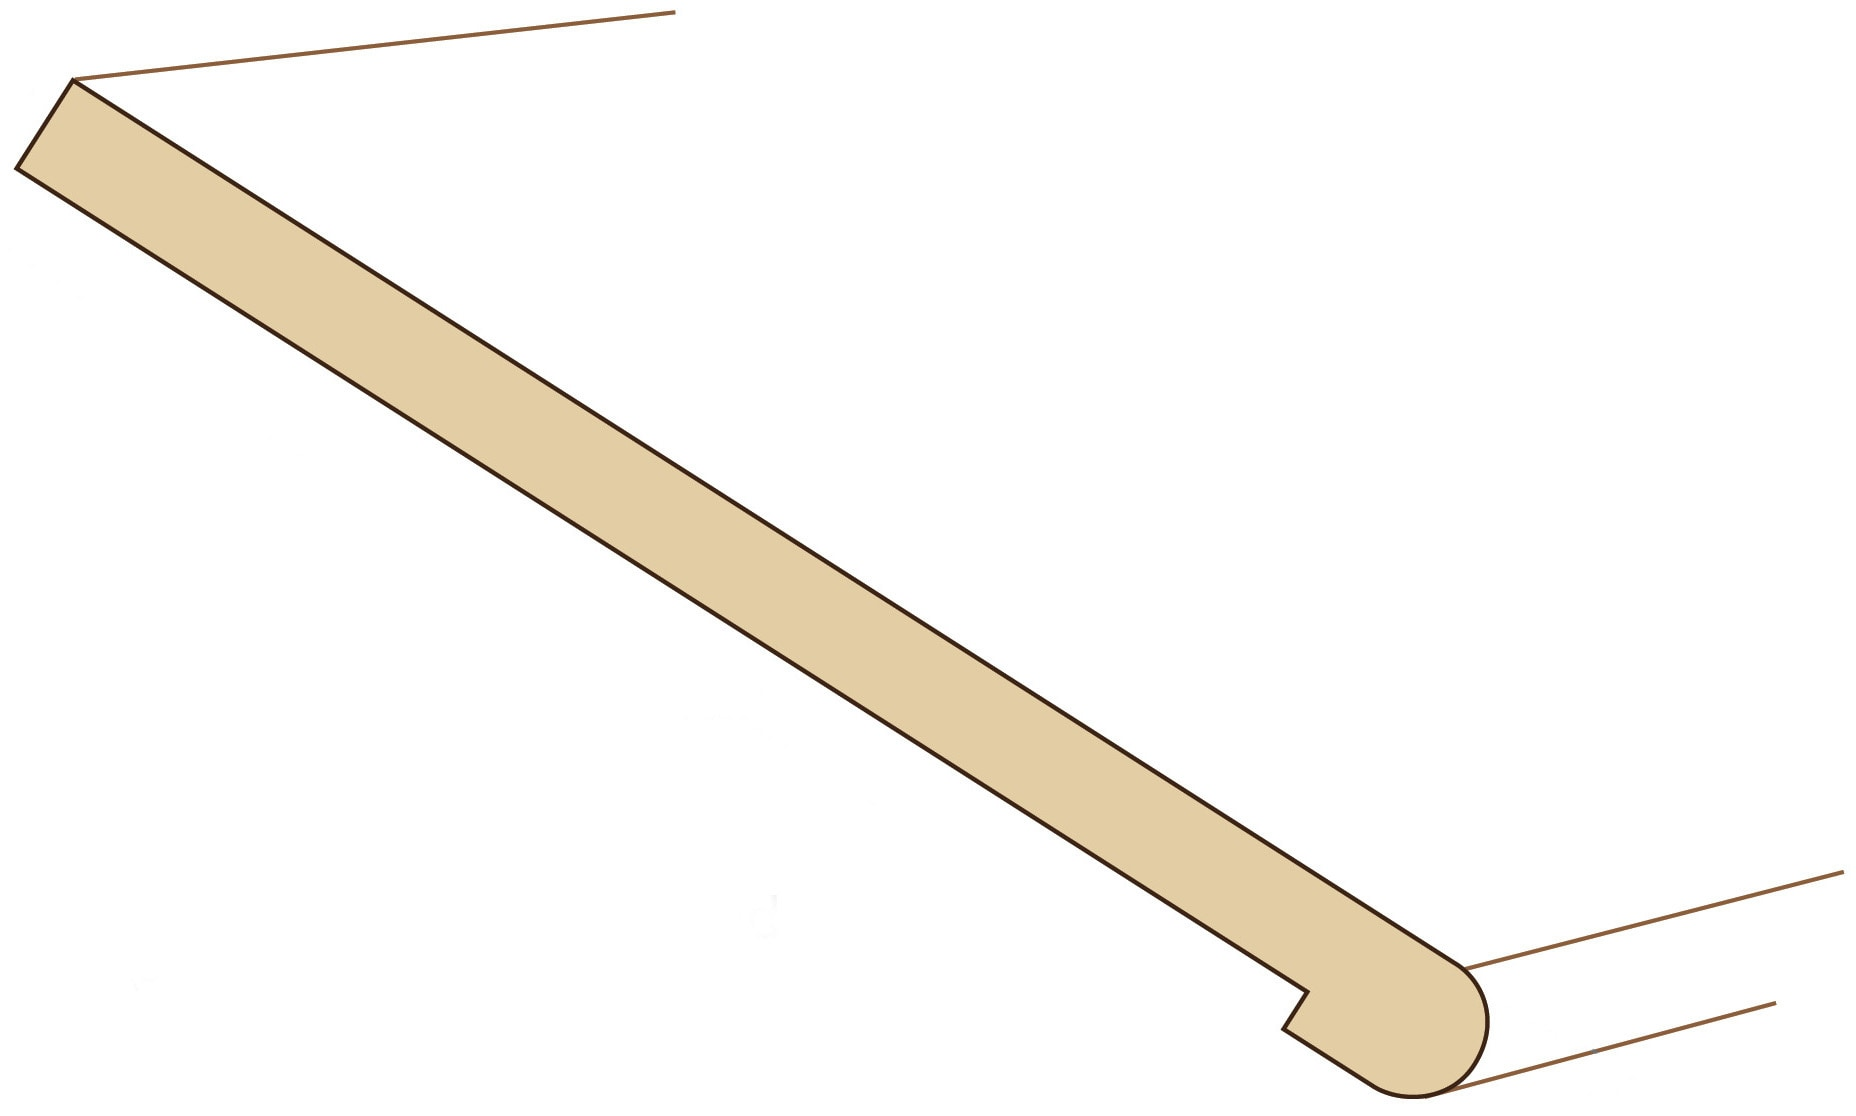 Robin / TREAD STANDARD NO RETURN 36 / 402 Engineered Hardwood Moldings - European Oak Whitewash 0